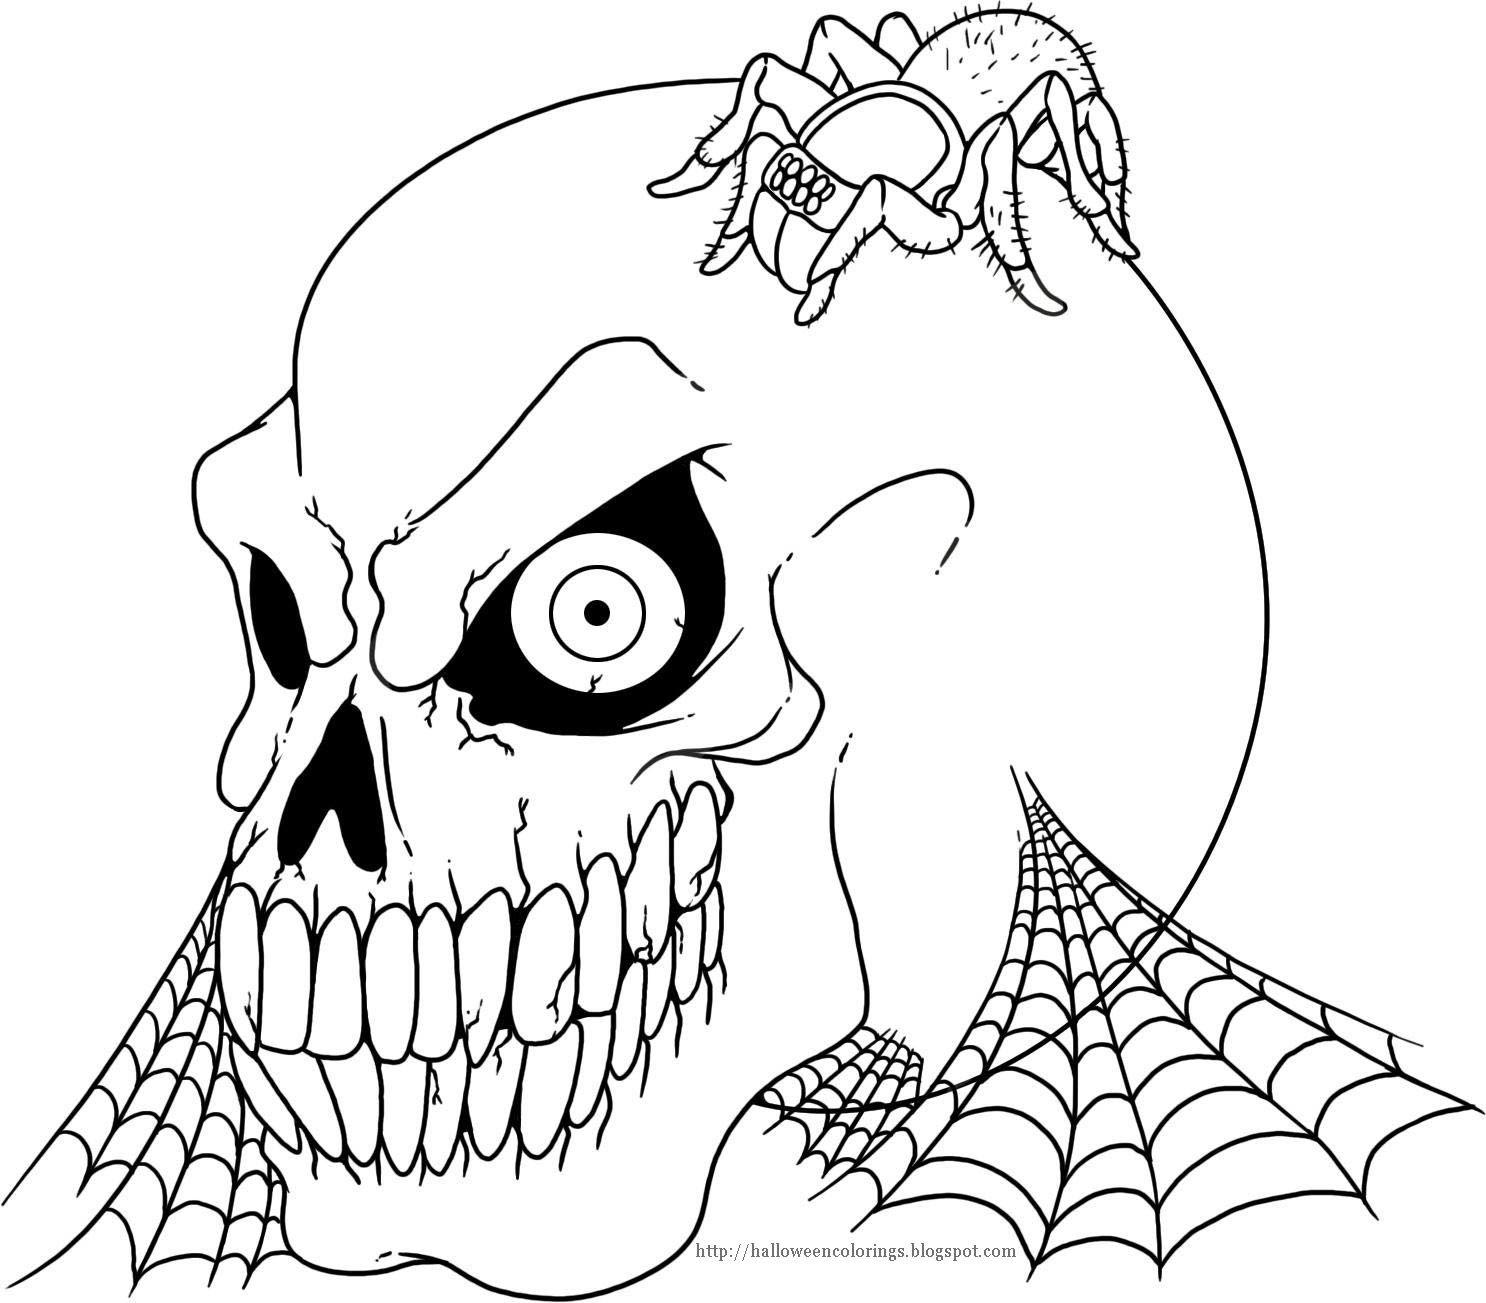 Skull Spider Halloween Witch Wizard Pumpkin Jack O Lantern Trick Or Treat Zombie Mummy Wolfman